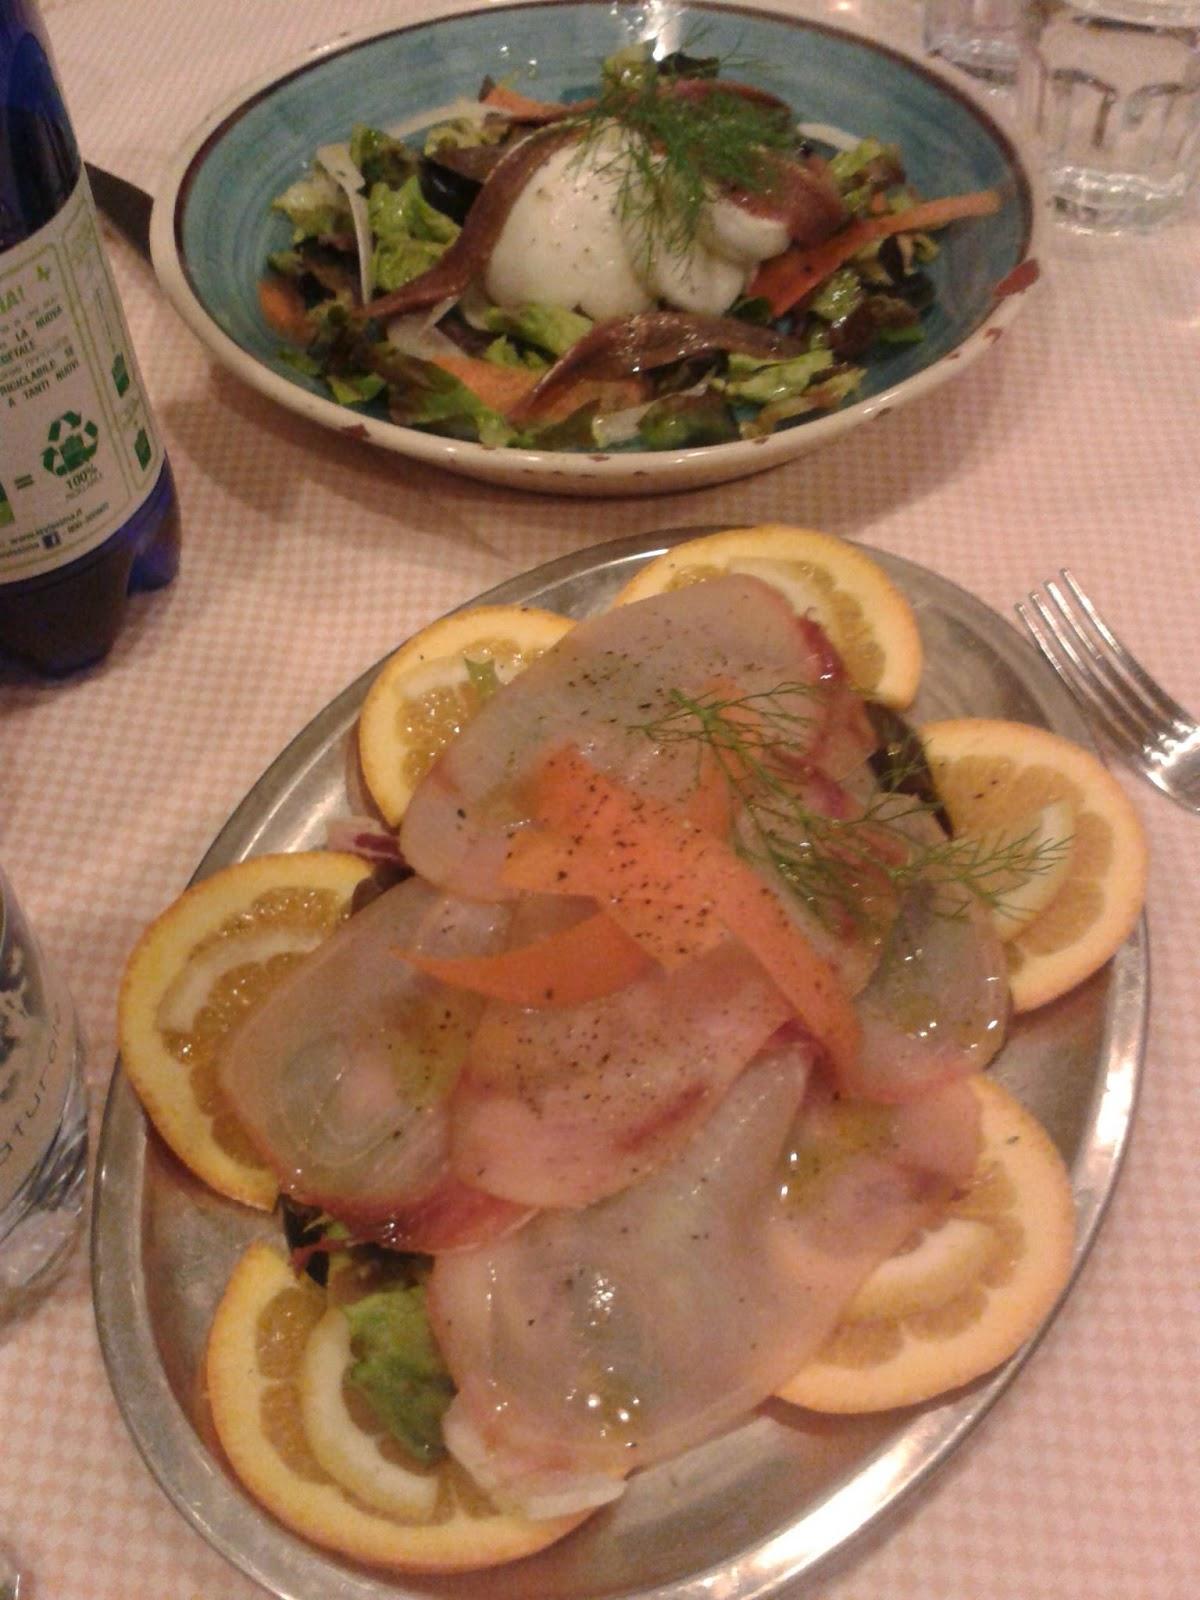 Rabarberdromen sicilia in tavola - Sicilia in tavola siracusa ...